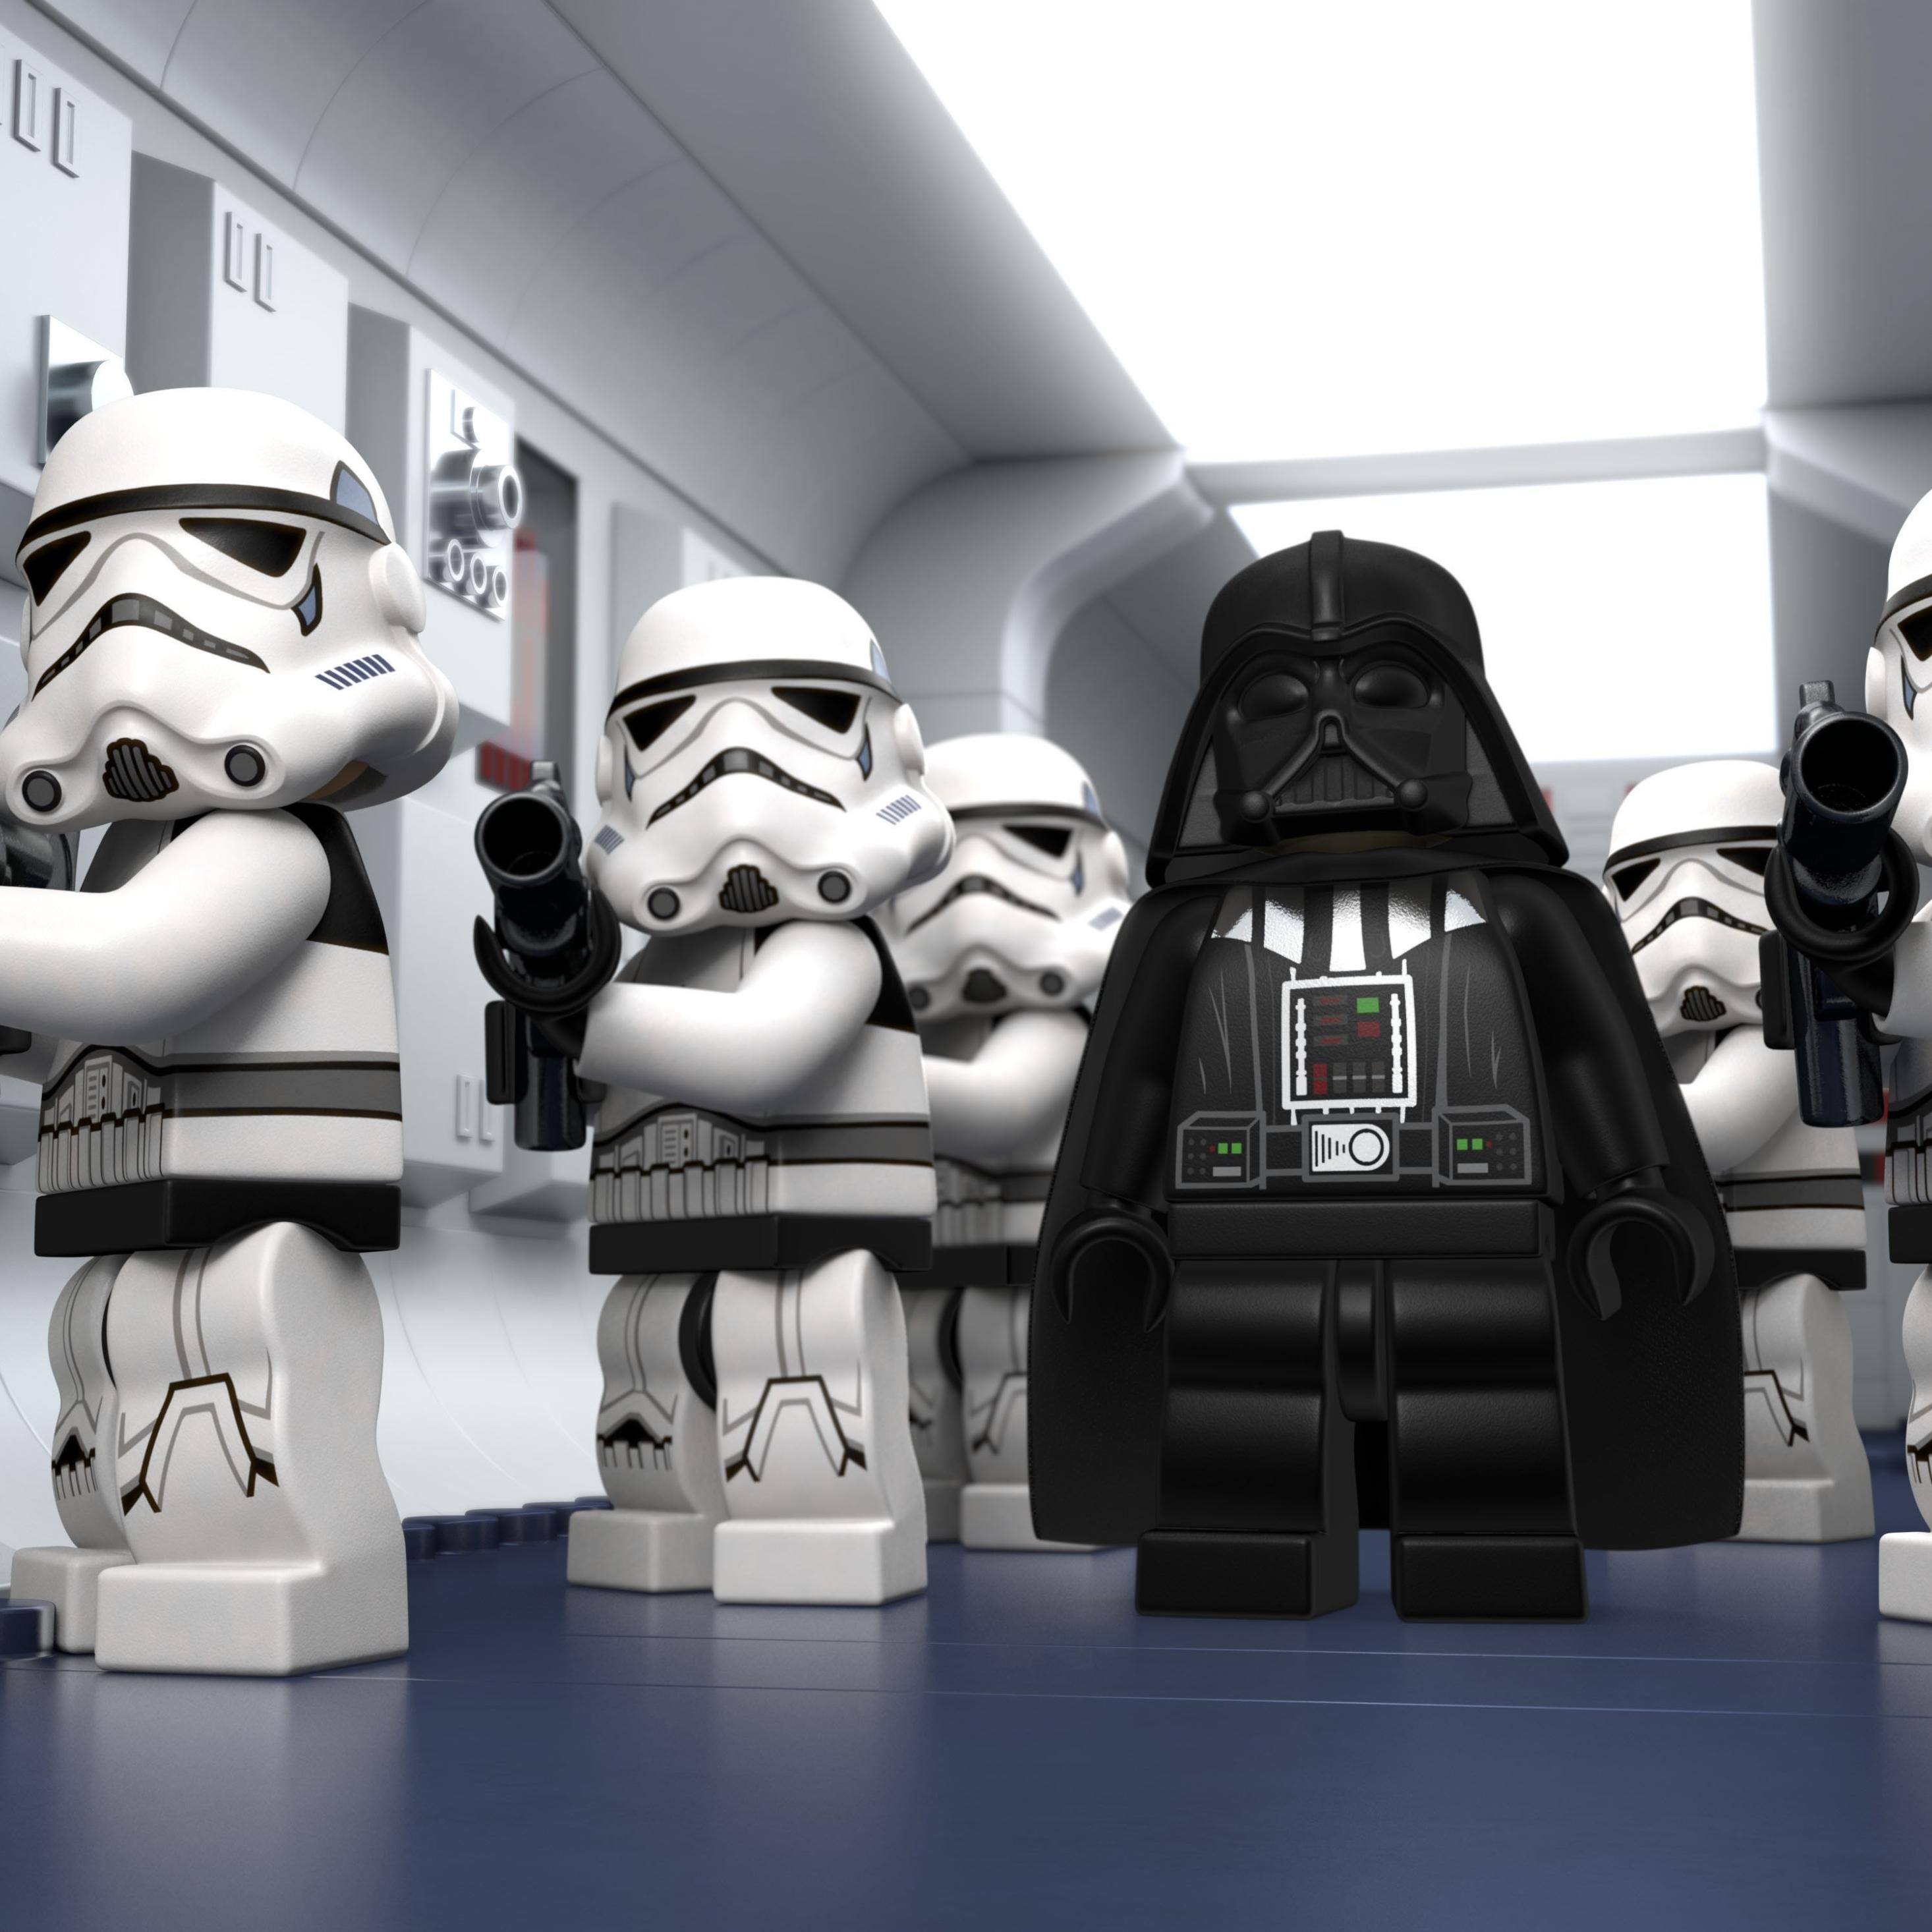 Lego Star Wars Droid Tales Stormtrooper, HD 4K Wallpaper